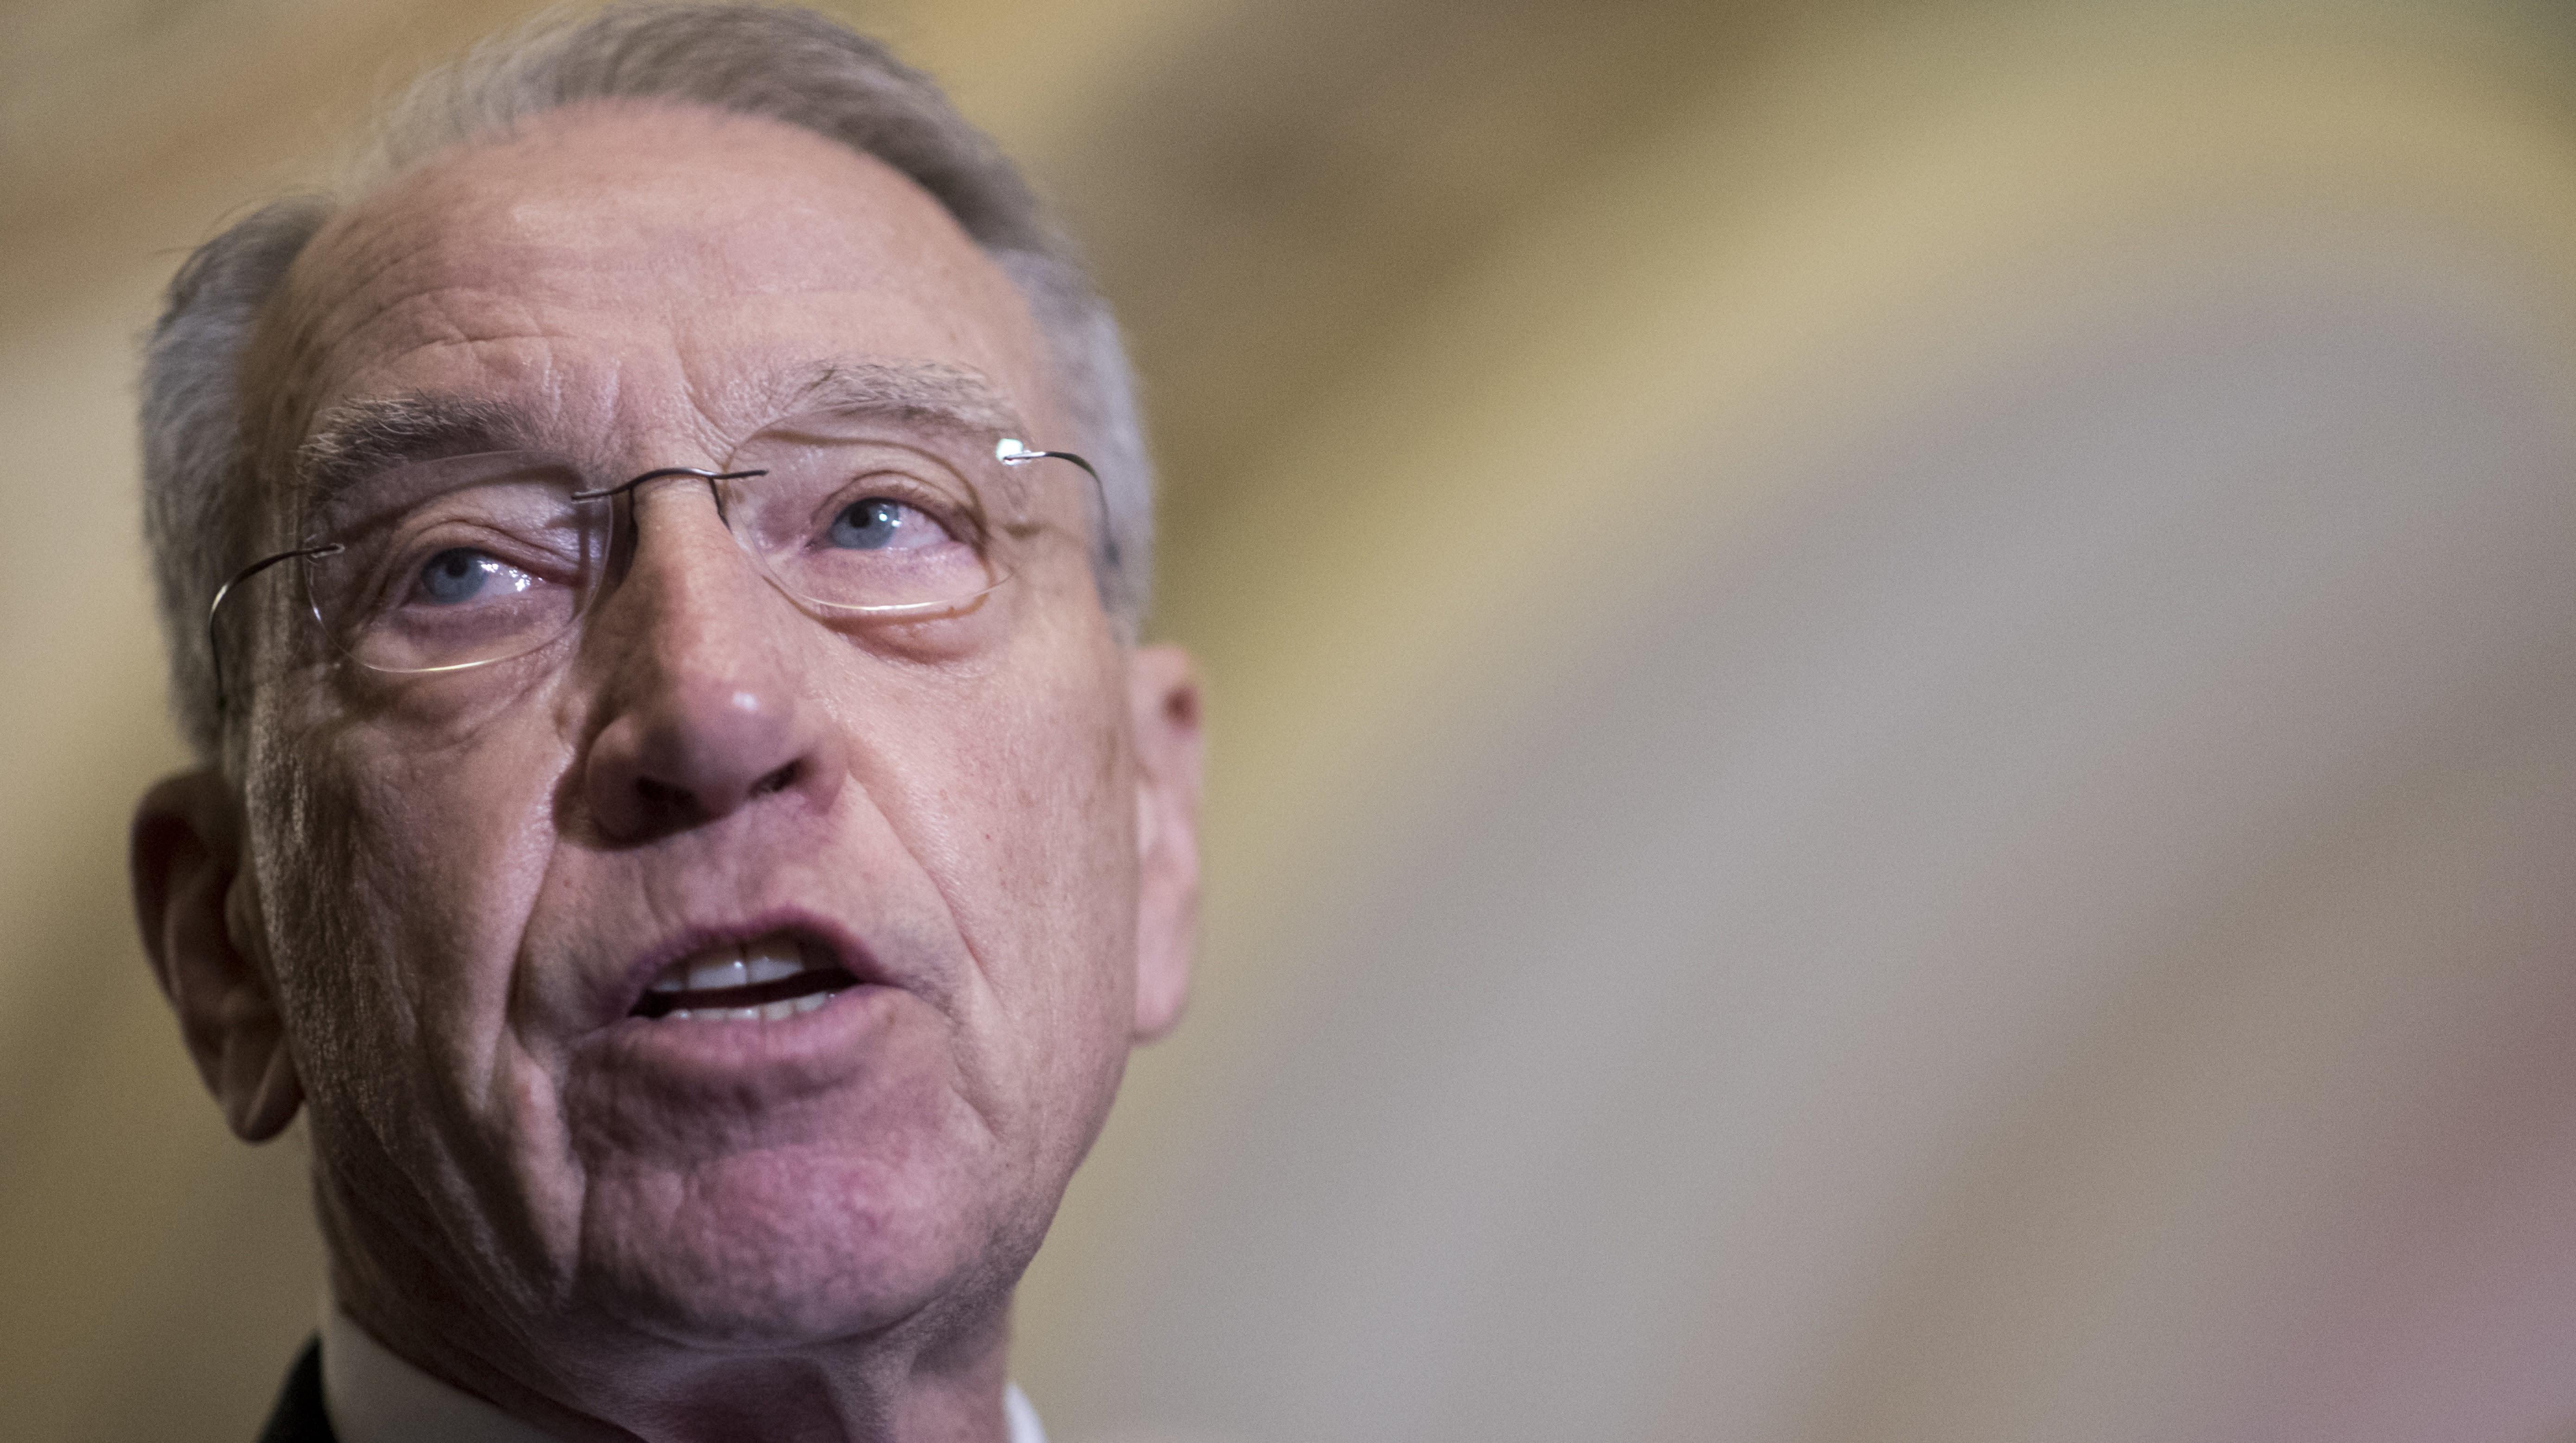 GOP Senator Implies Those Who Aren't Millionaires Waste Money On 'Booze, Women'